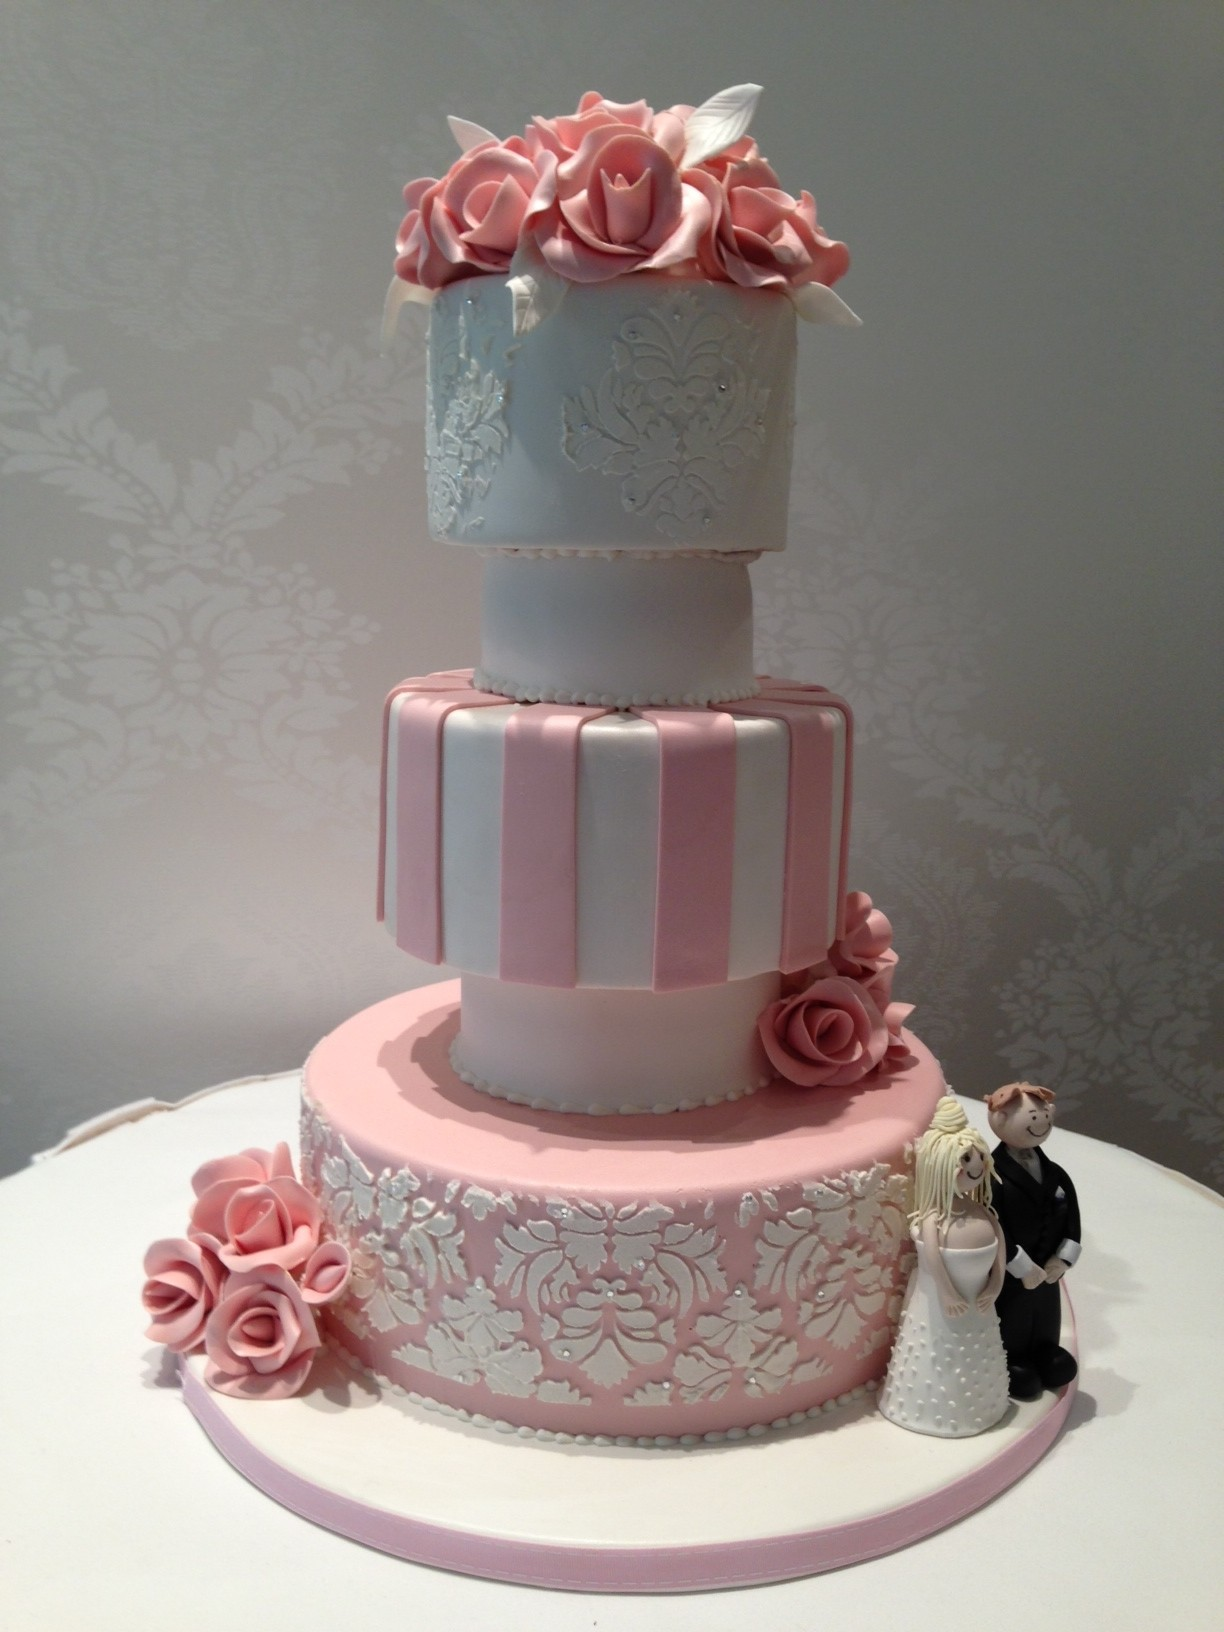 Wedding cake wedding cake pink and white damask stripe design with flowers mightylinksfo